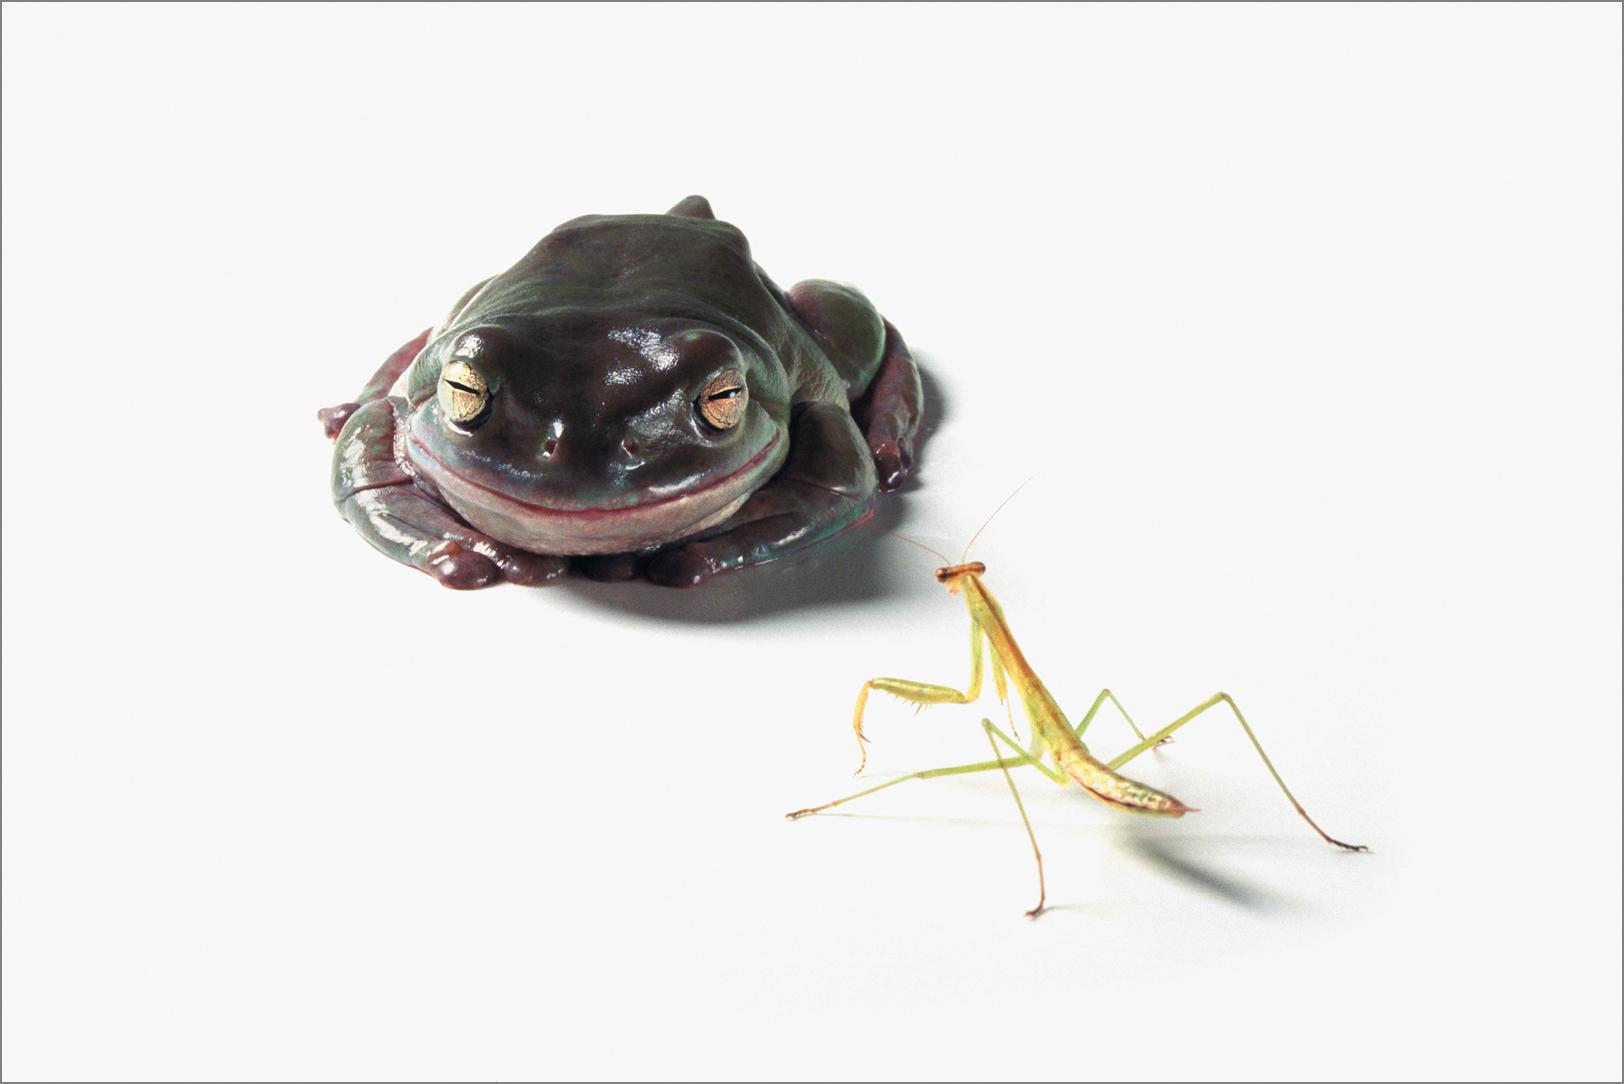 fc_frog1_4g.jpg